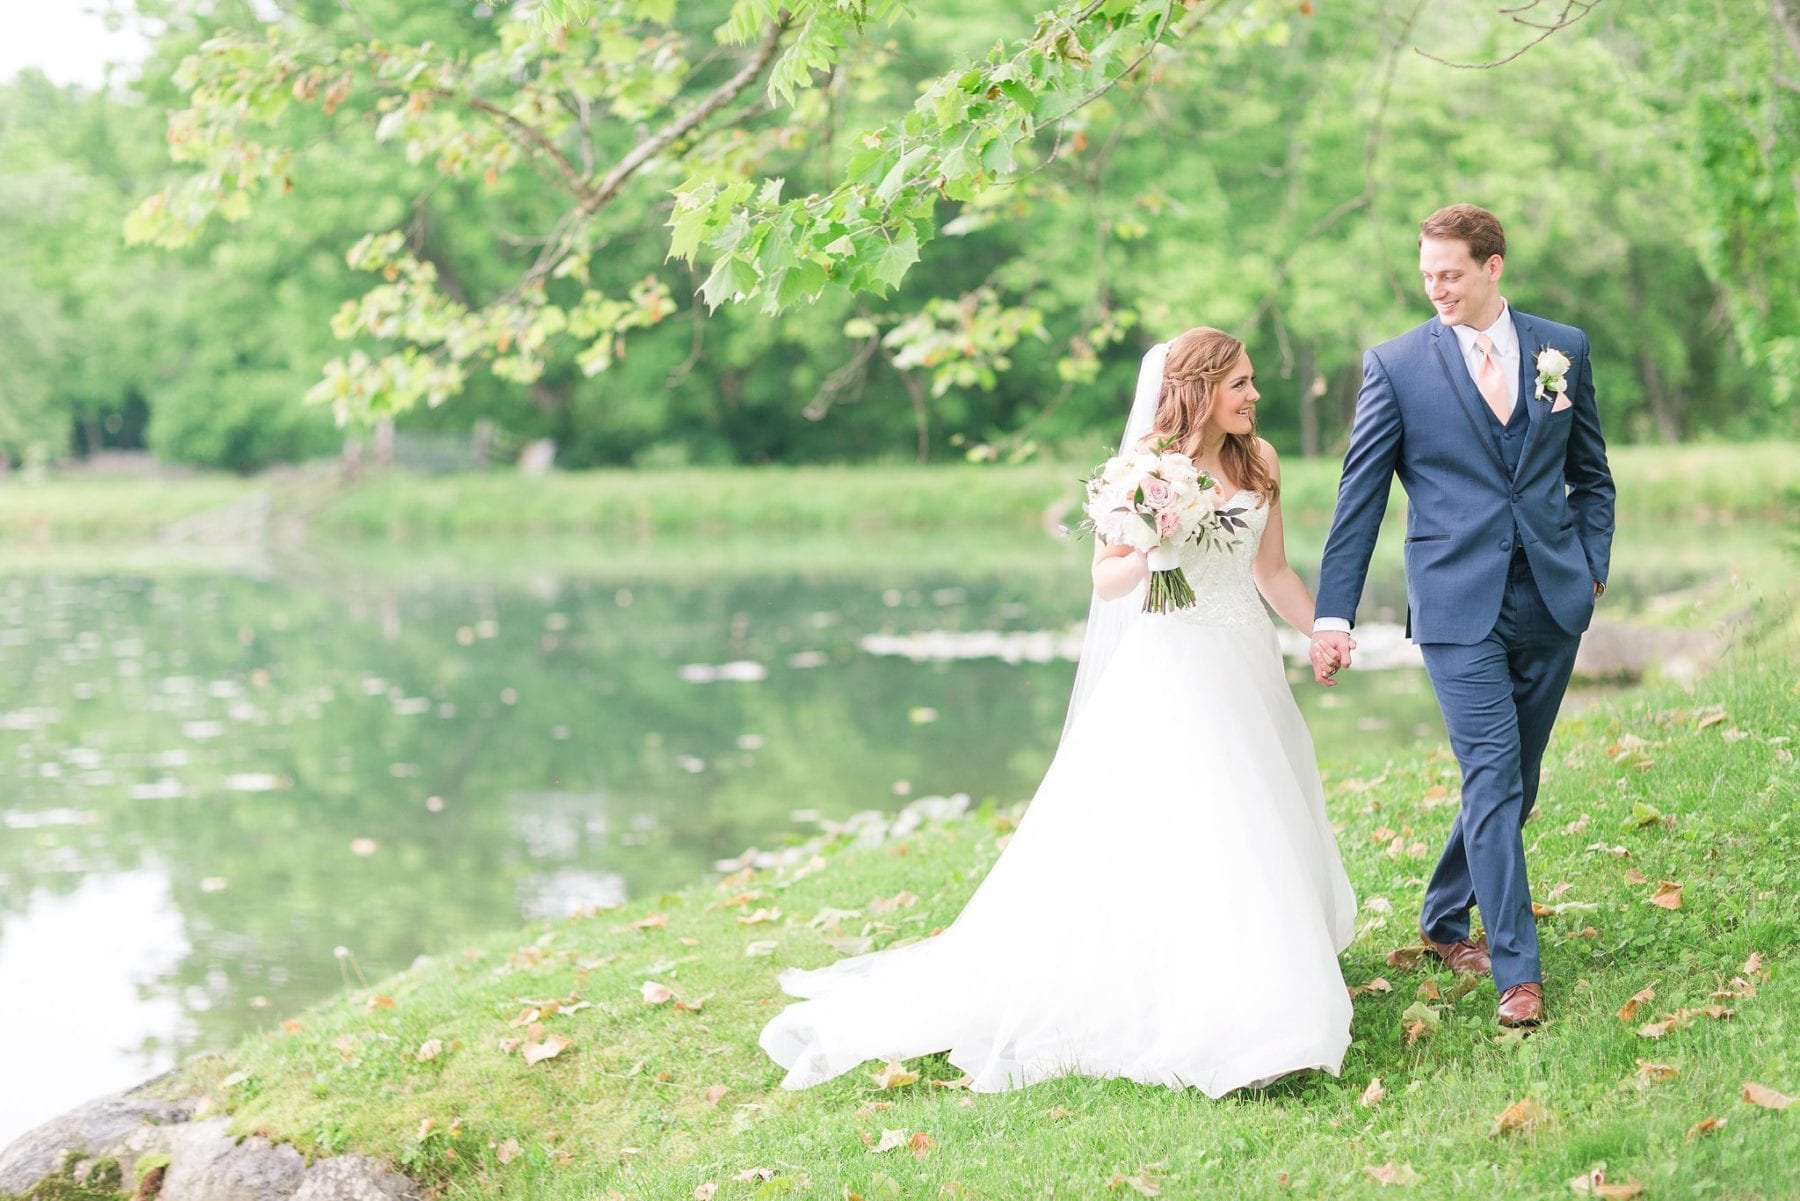 Justin & Megan Big Spring Farm Wedding Photos-199.jpg